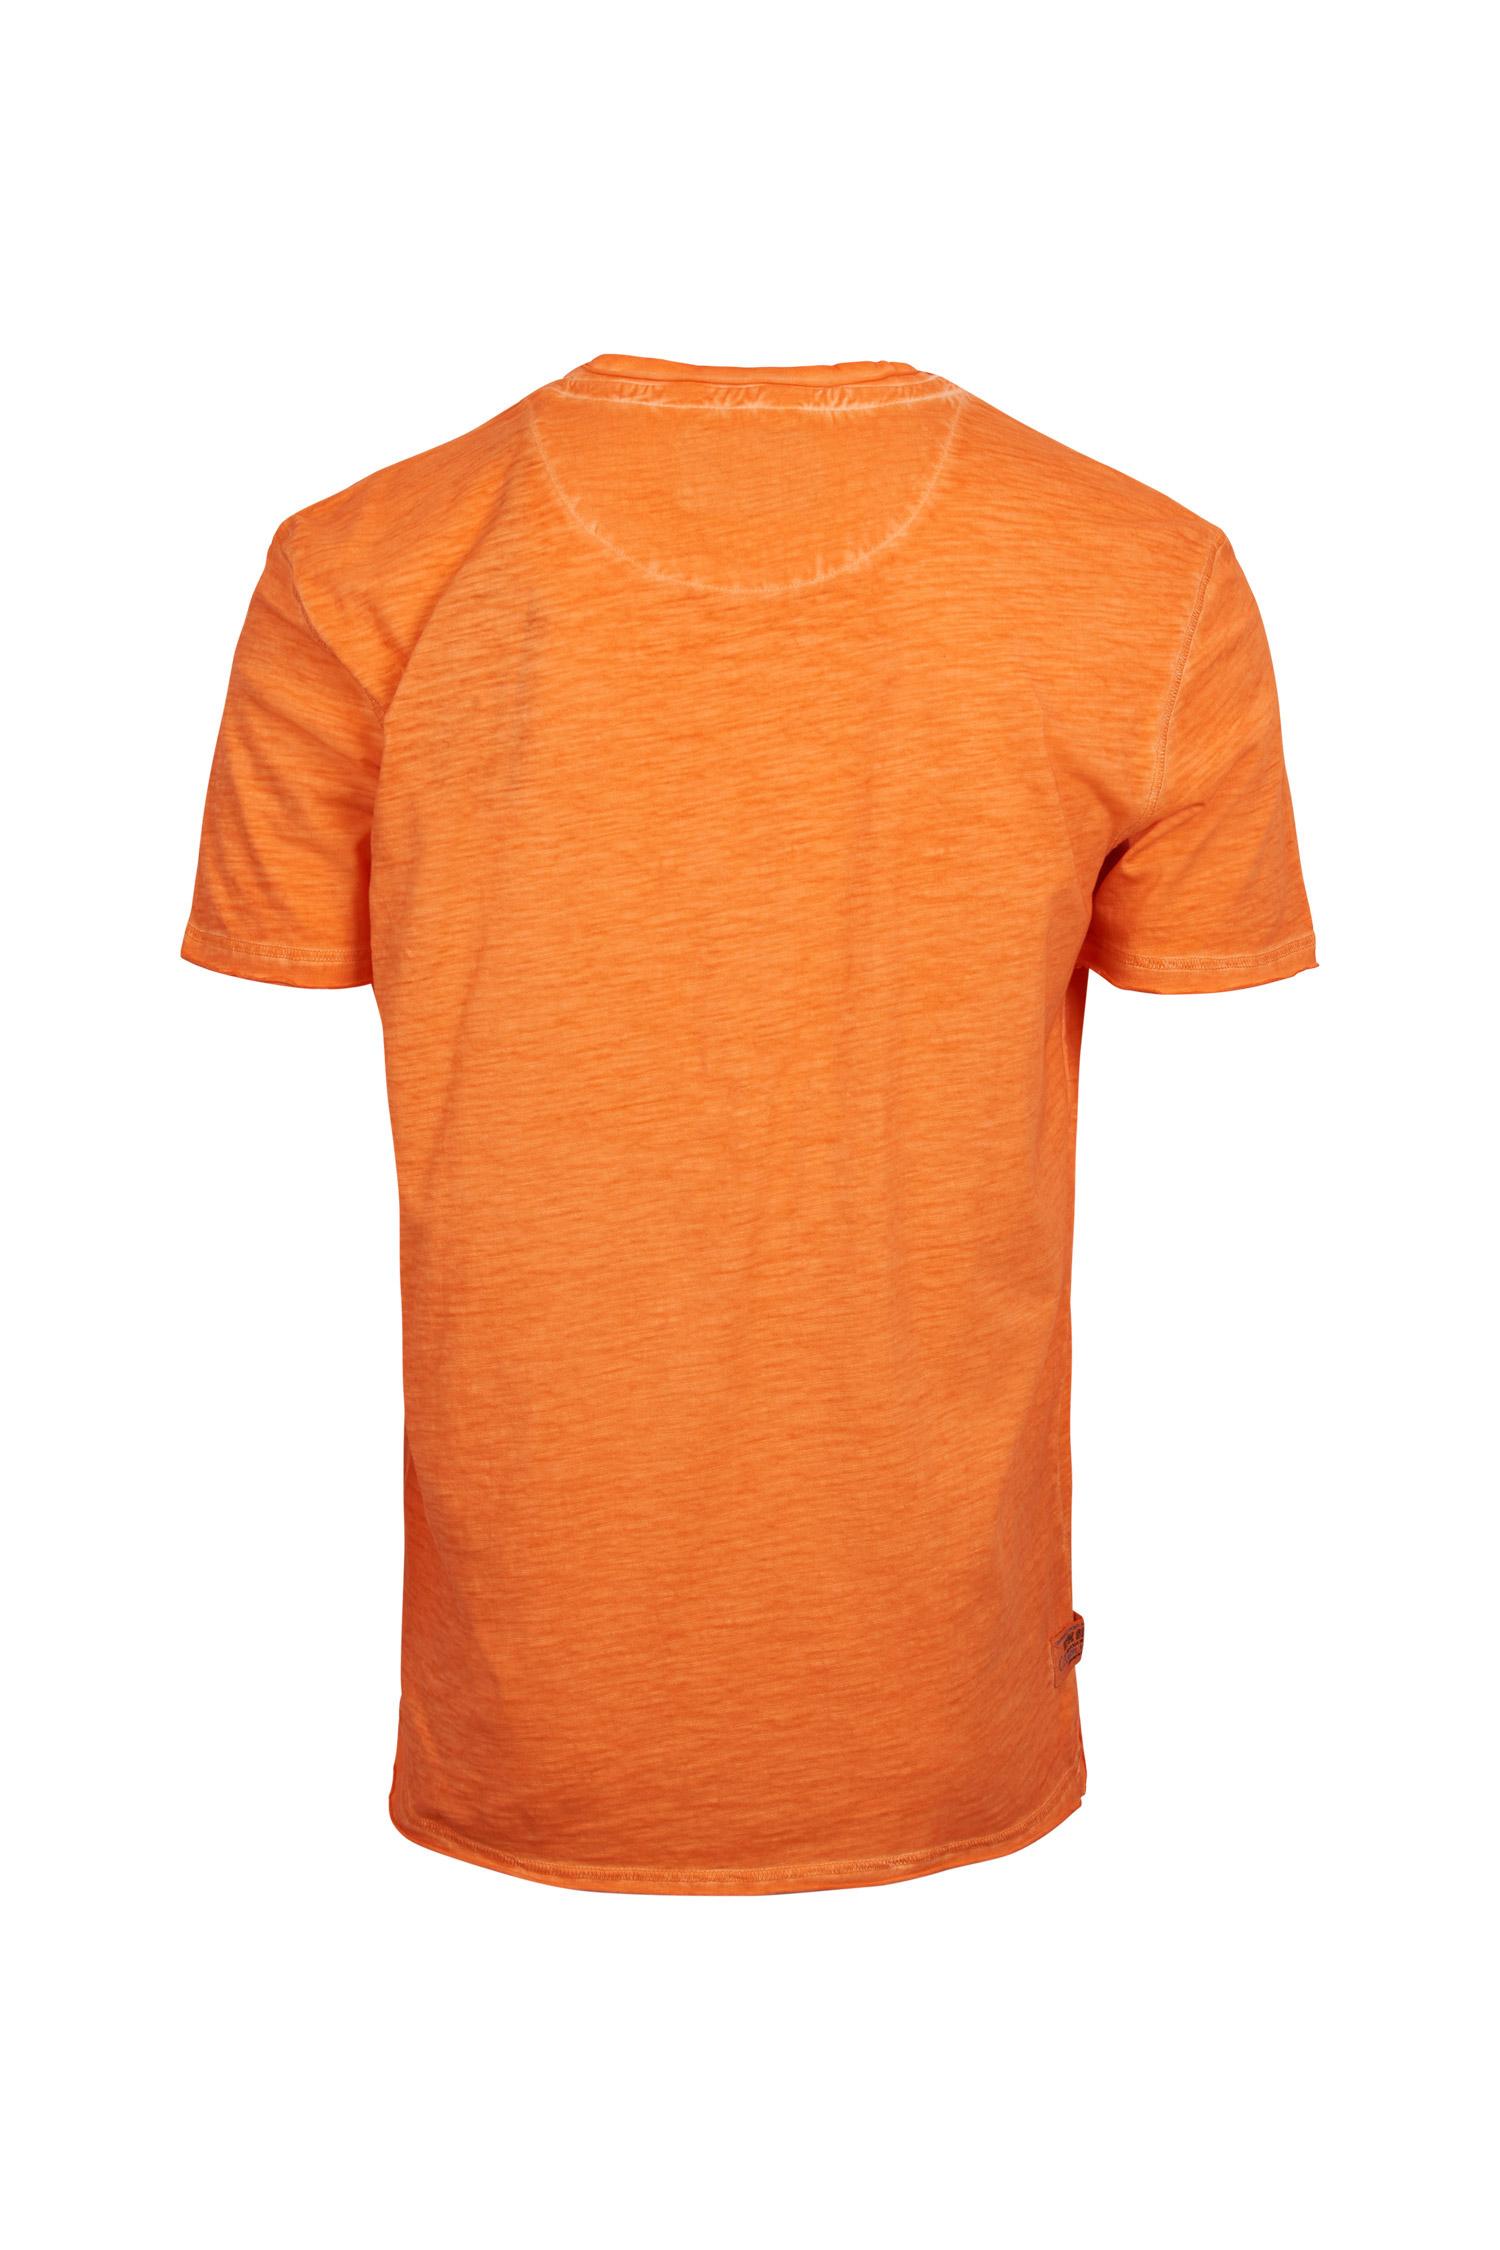 Sport, Camisetas M. Corta, 109157, NARANJA | Zoom